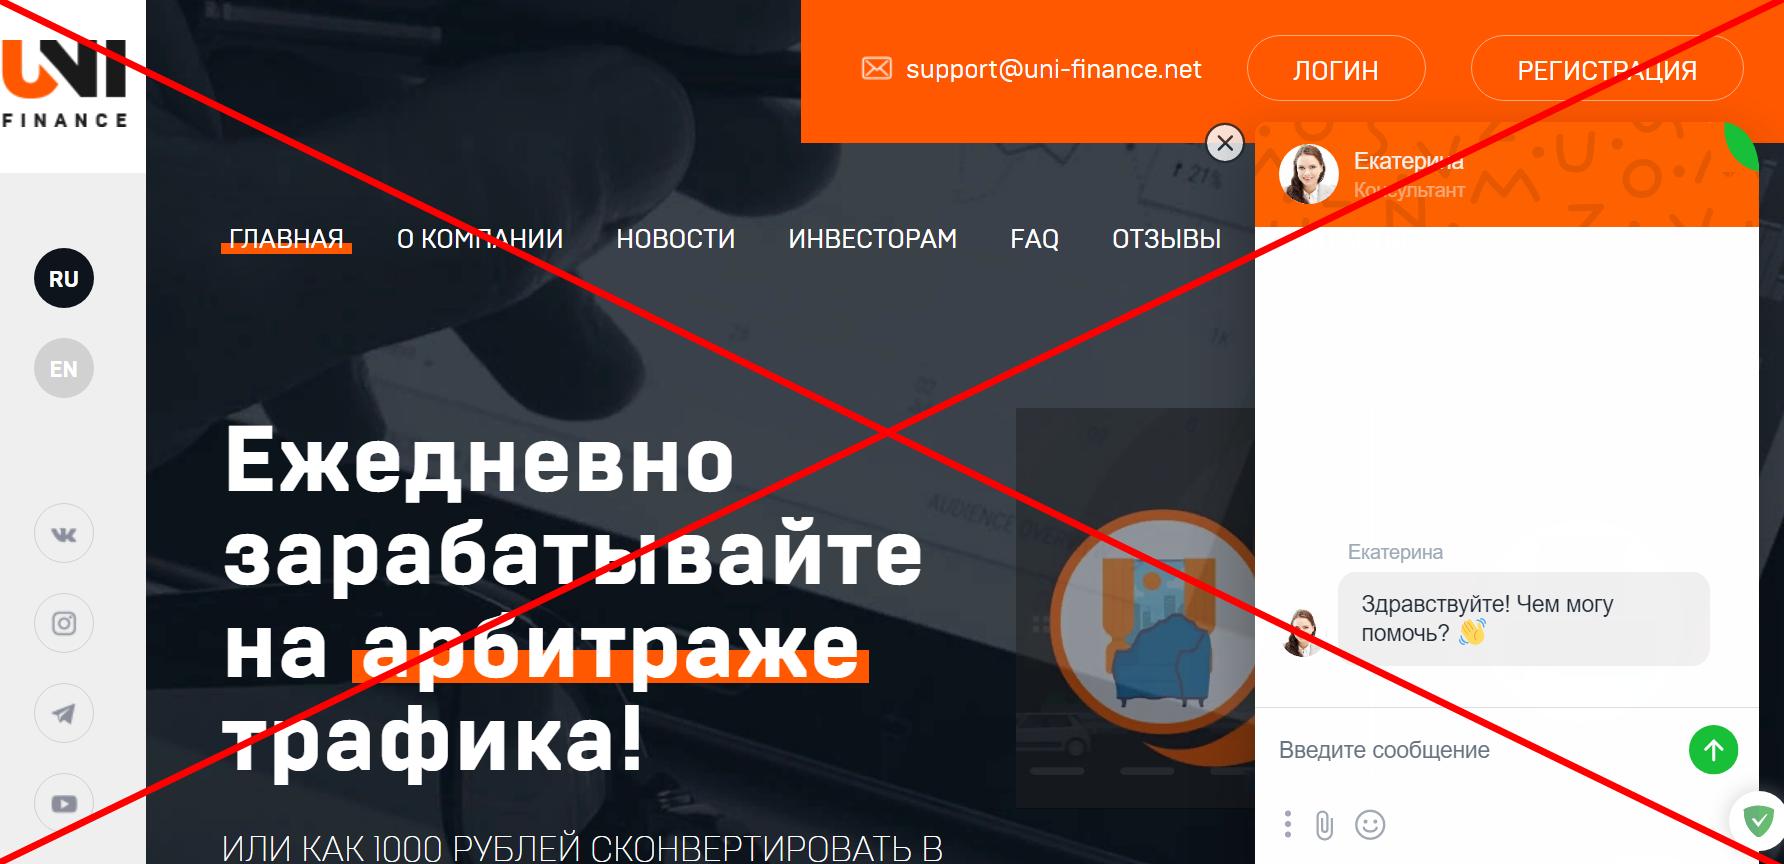 Uni Finance (uni-finance.net) - отзывы клиентов